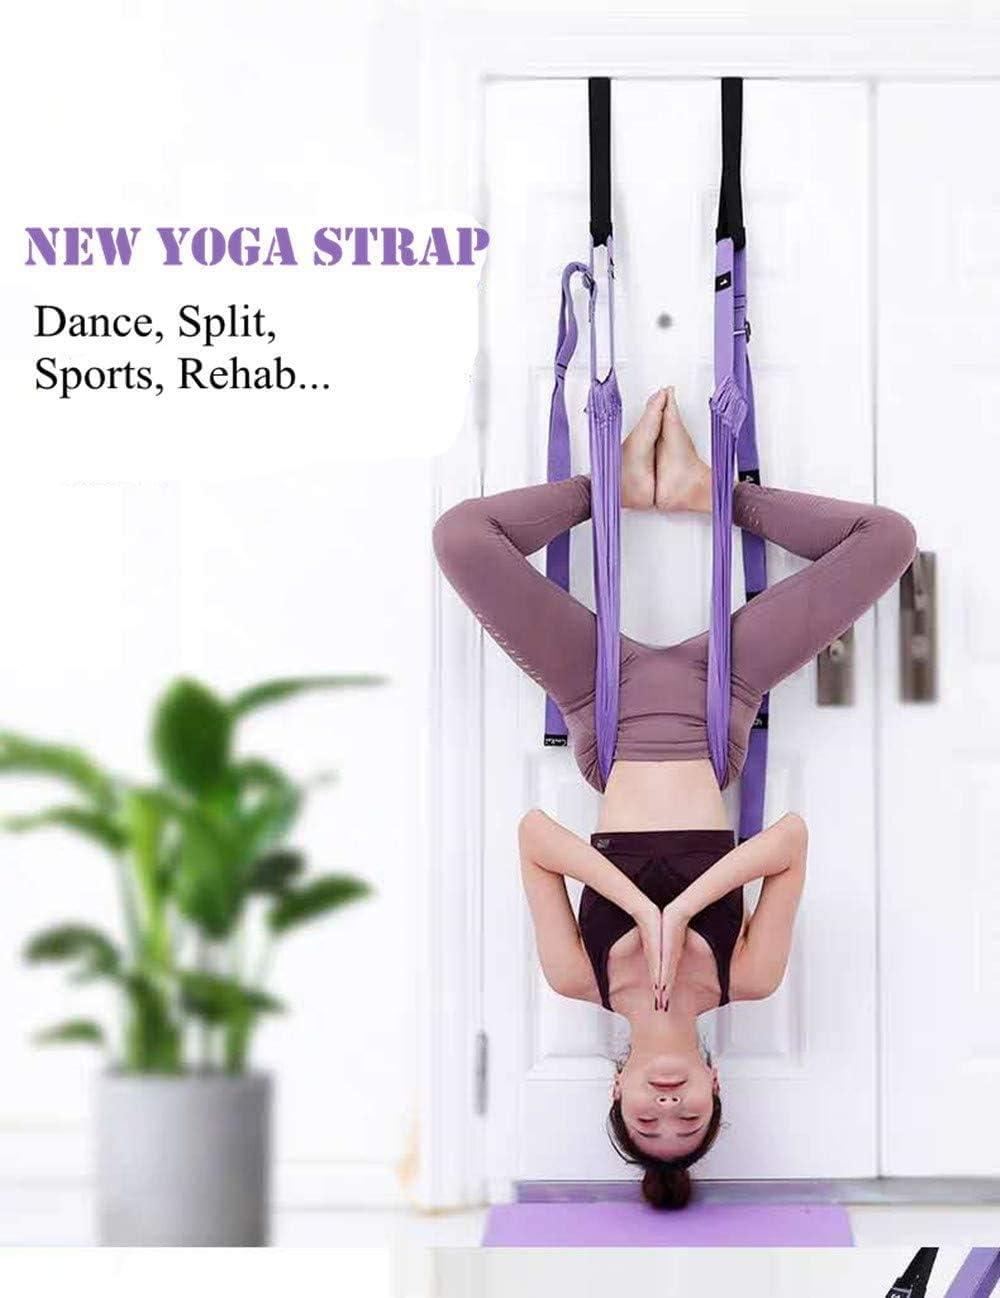 Yoga Stretcher Gymnastics Ballet Back Bend Split Inversion Strap for Fitness Dance Leg Stretching Assist Trainer KimDaro Waist Back Leg Stretch Strap//Yoga Fitness Band